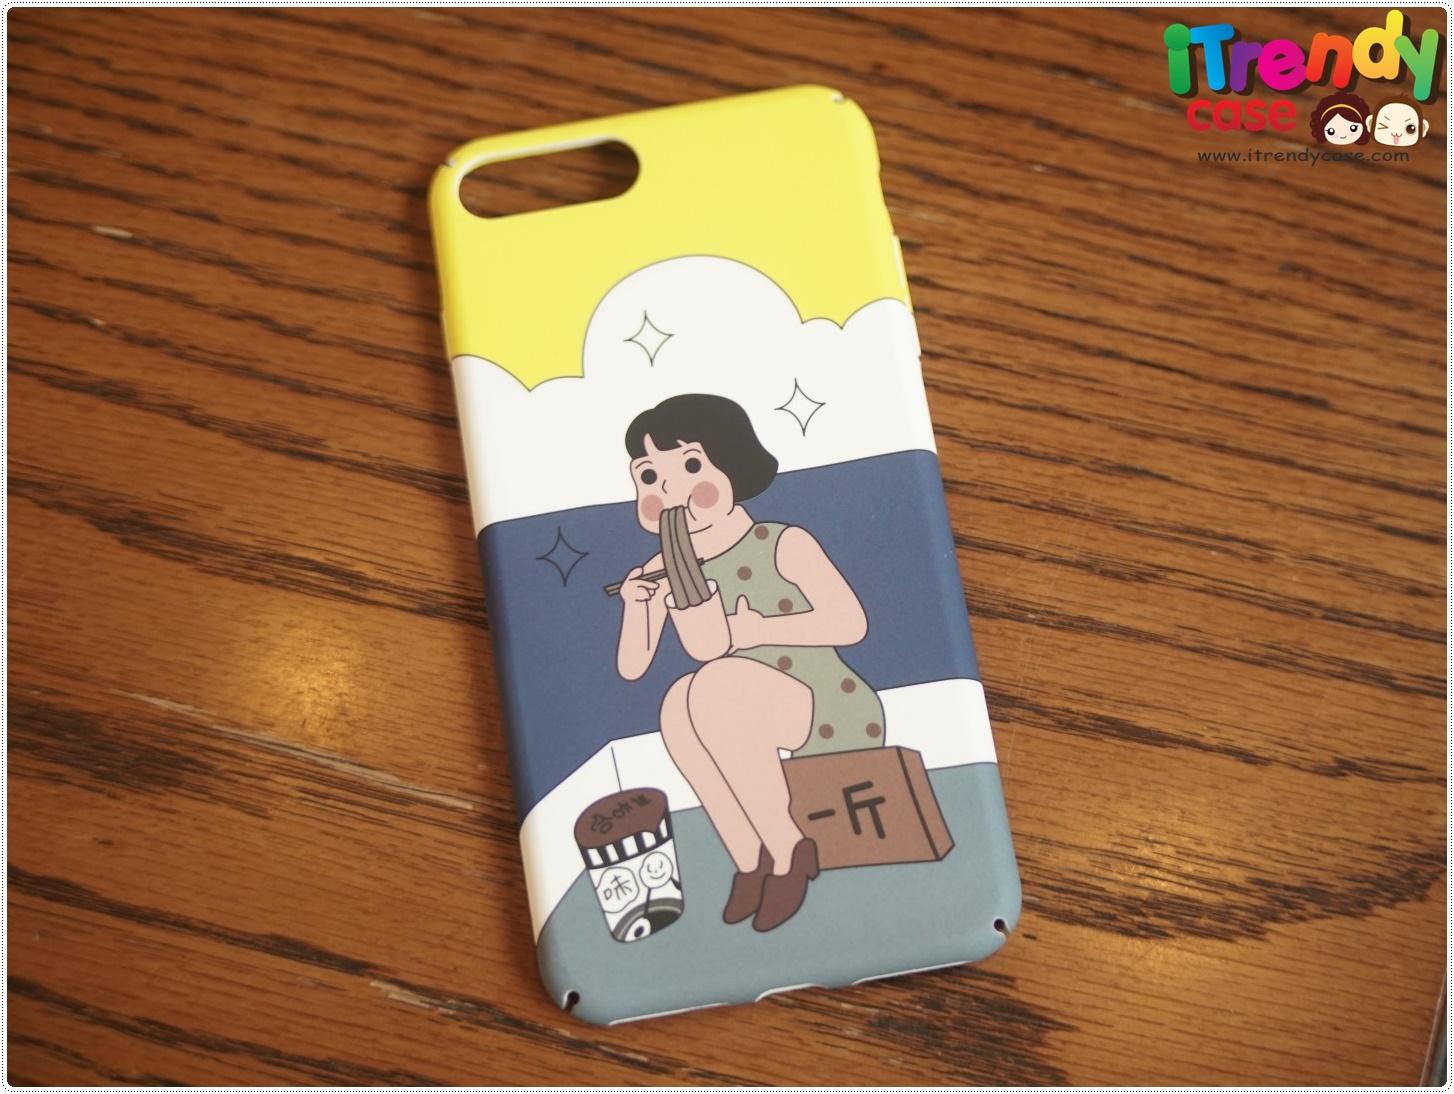 iPhone 7 Plus - เคสแข็งปิดขอบ ลายผู้หญิงญี่ปุ่น